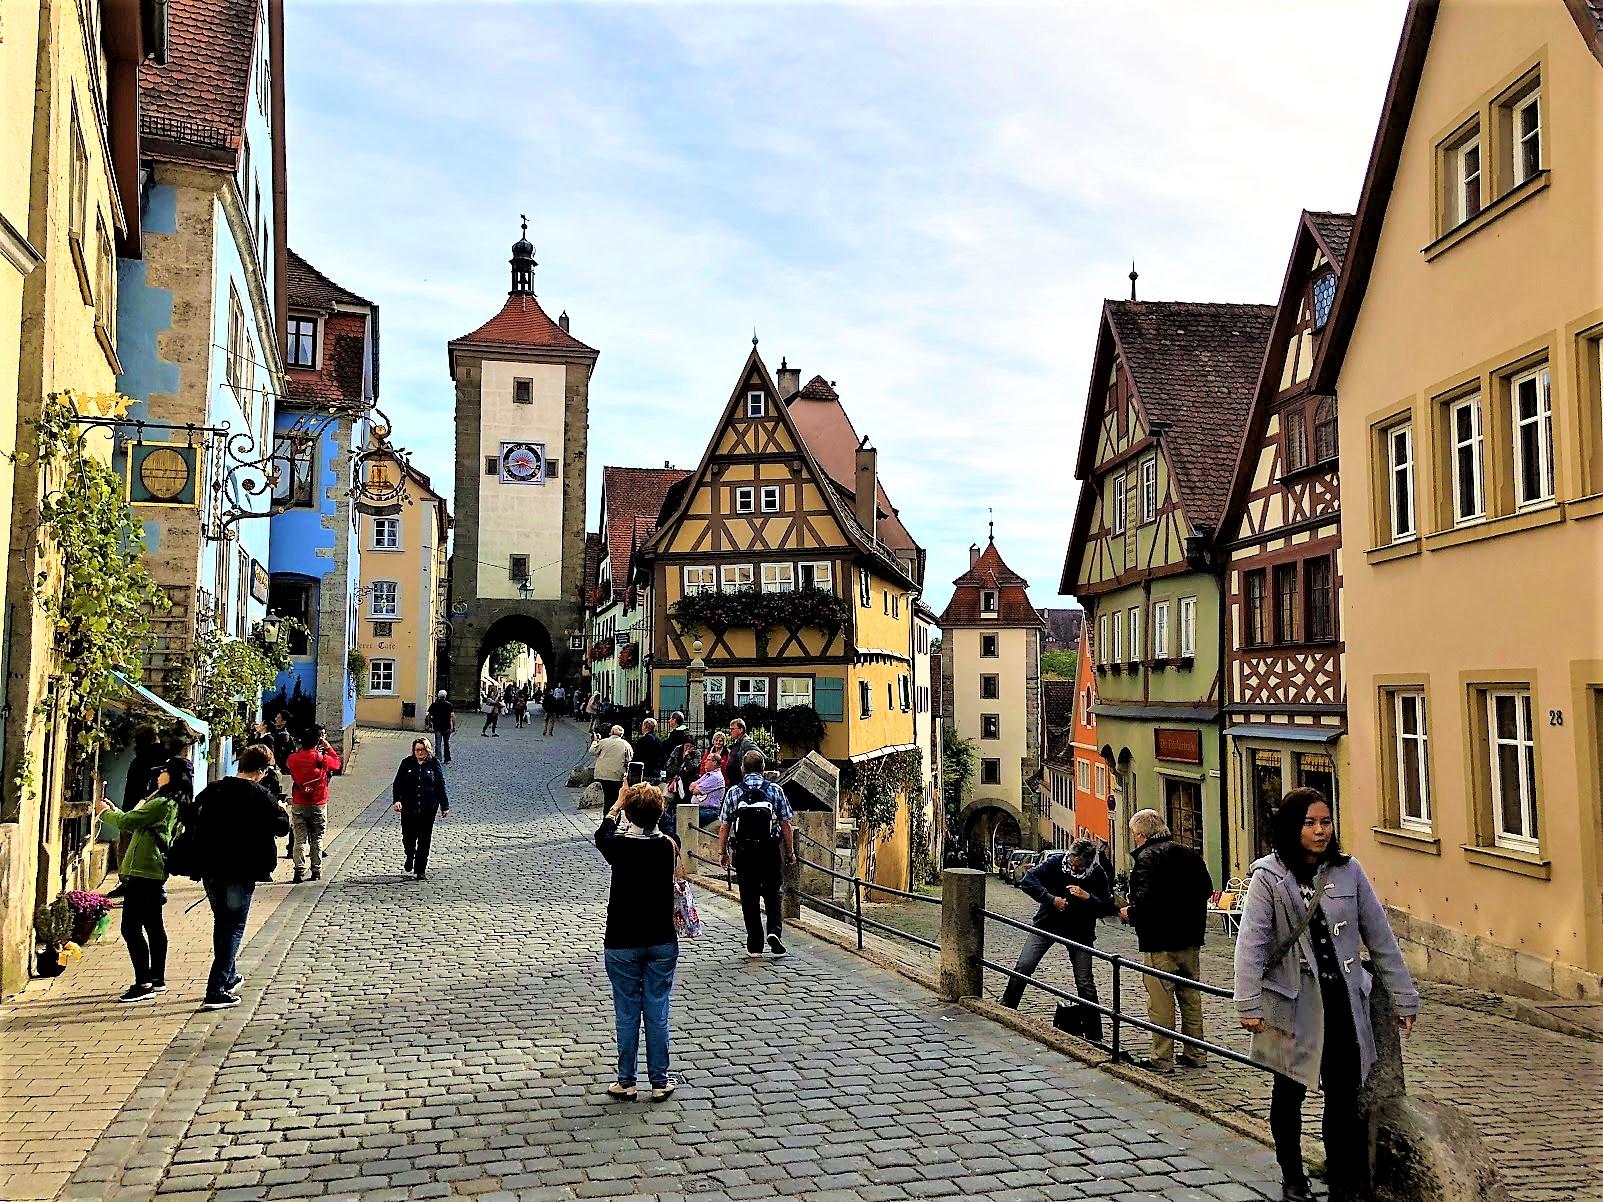 Rothenburg ob der Tauber, Germany street view